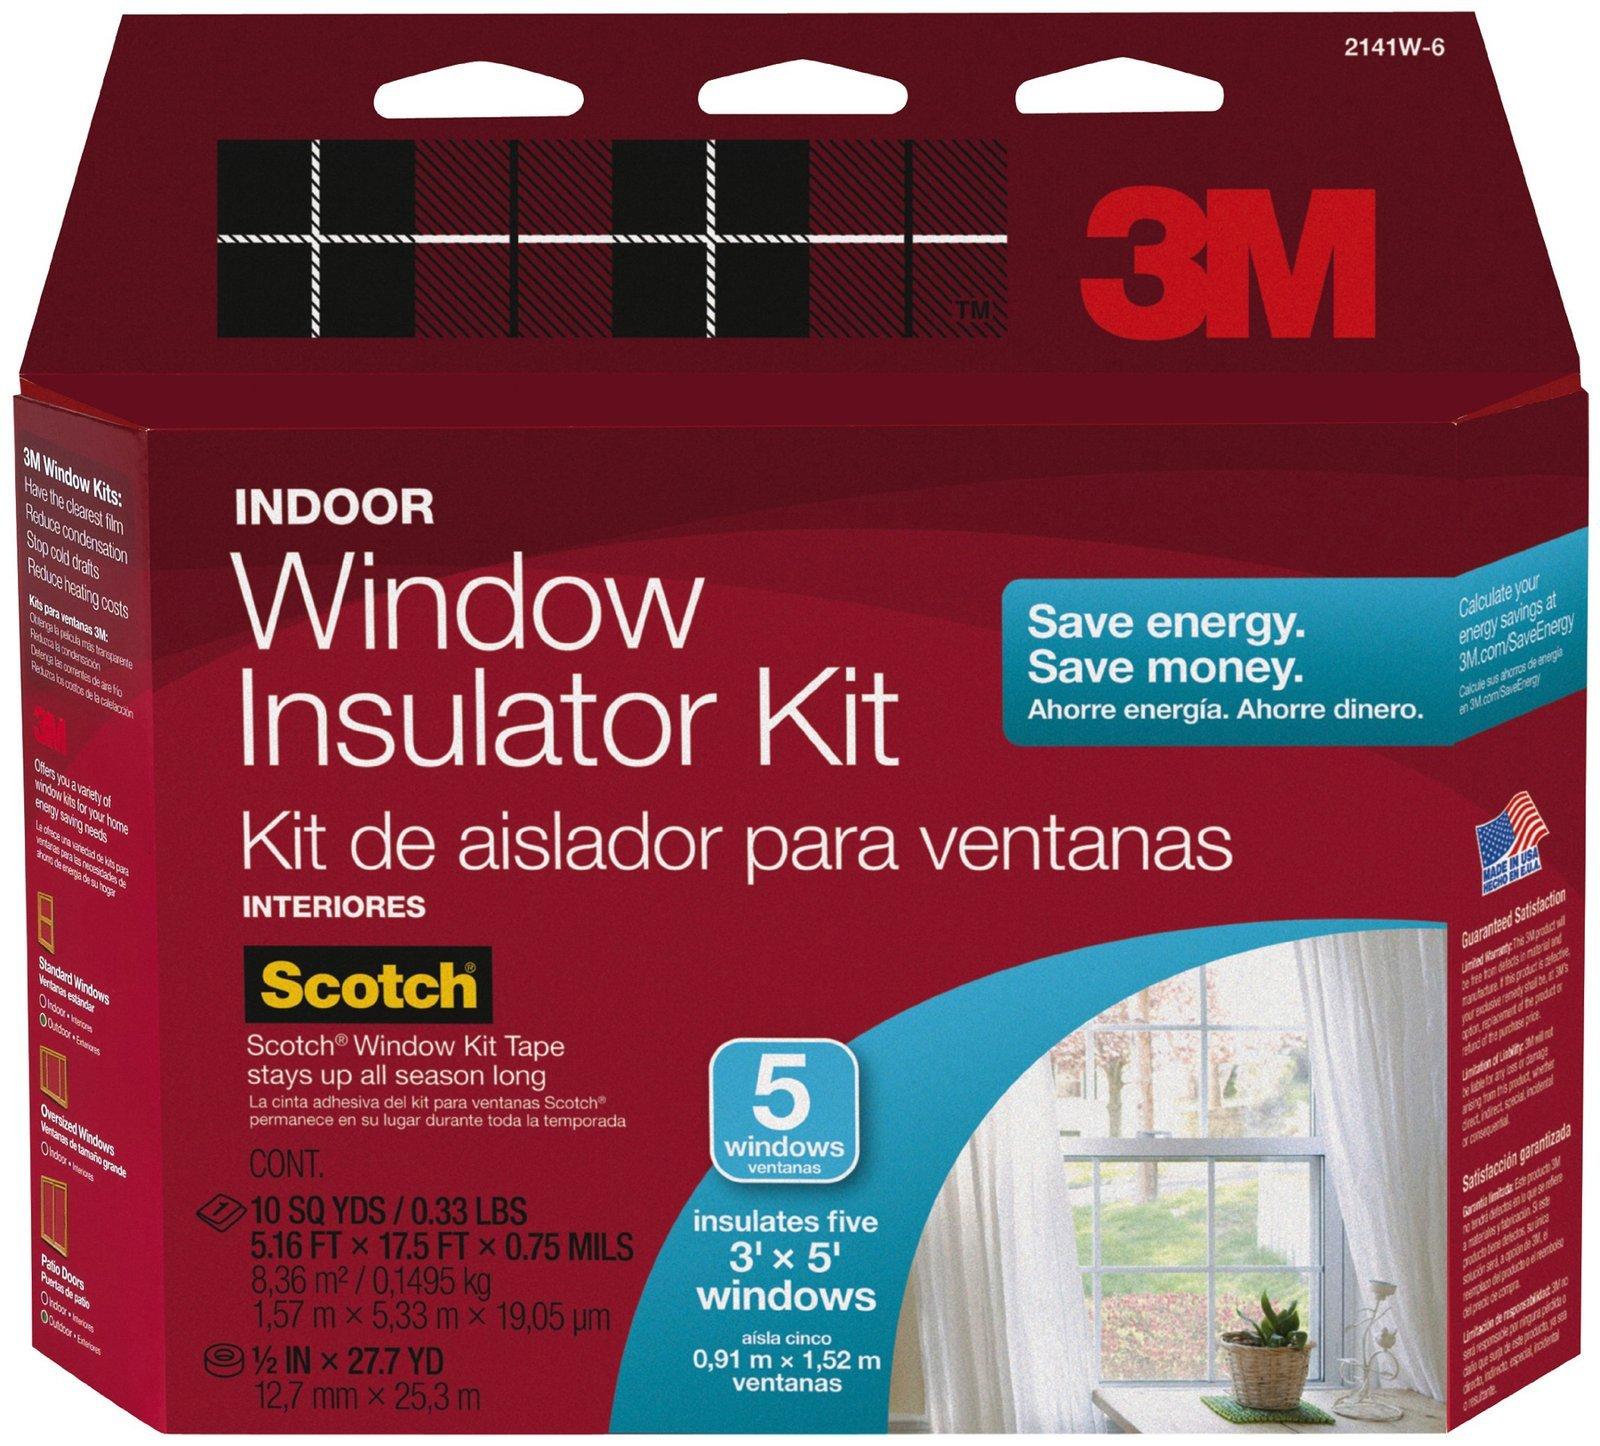 3M Indoor Window Insulator Kit, 62'' x 210''